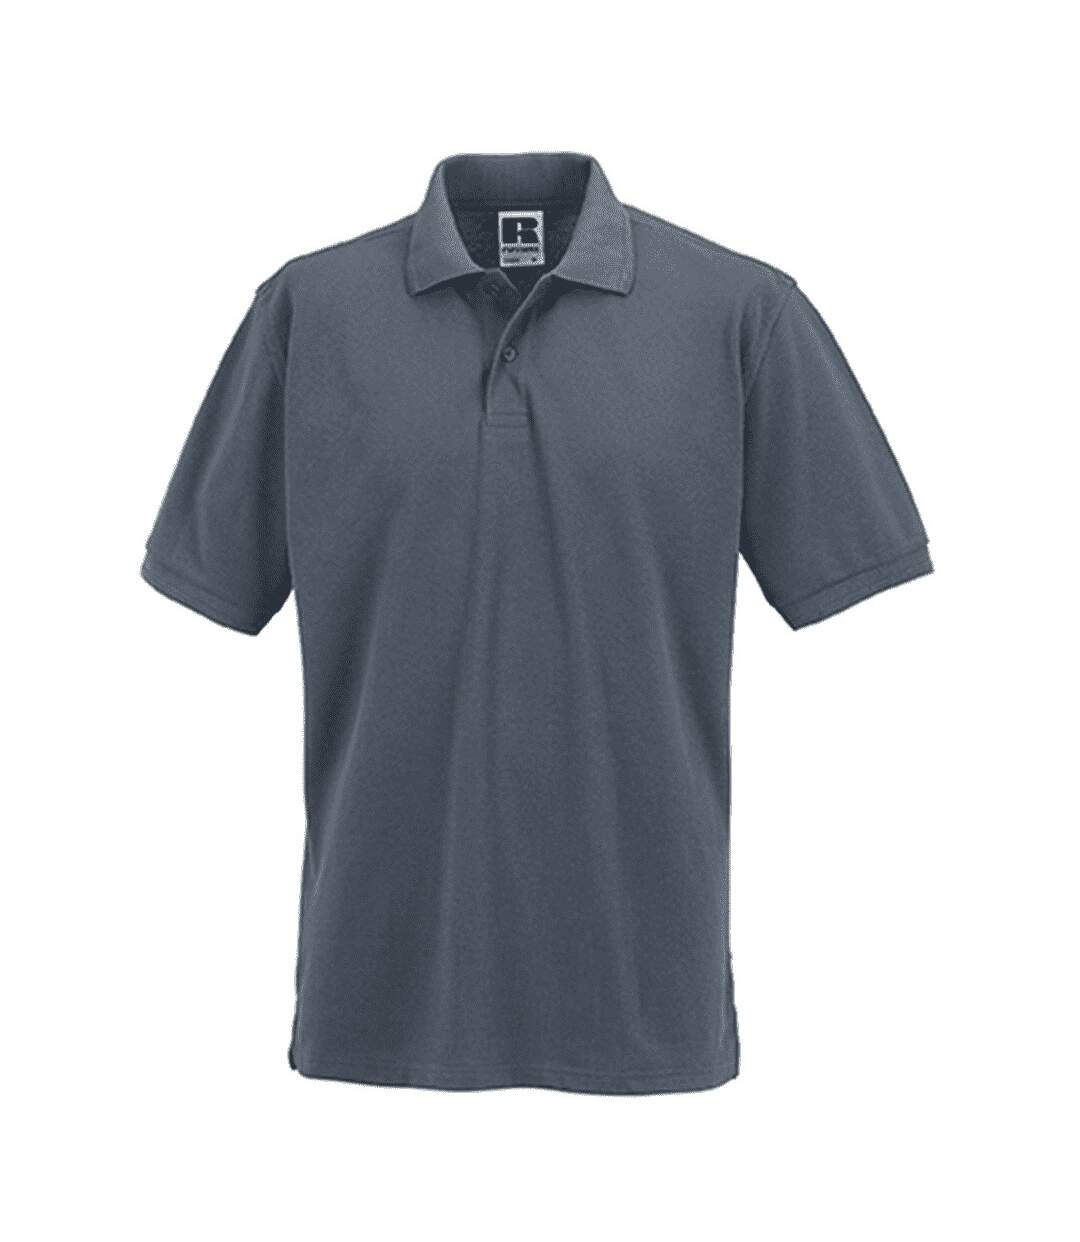 Russell Mens Ripple Collar & Cuff Short Sleeve Polo Shirt (Convoy Grey) - UTBC572